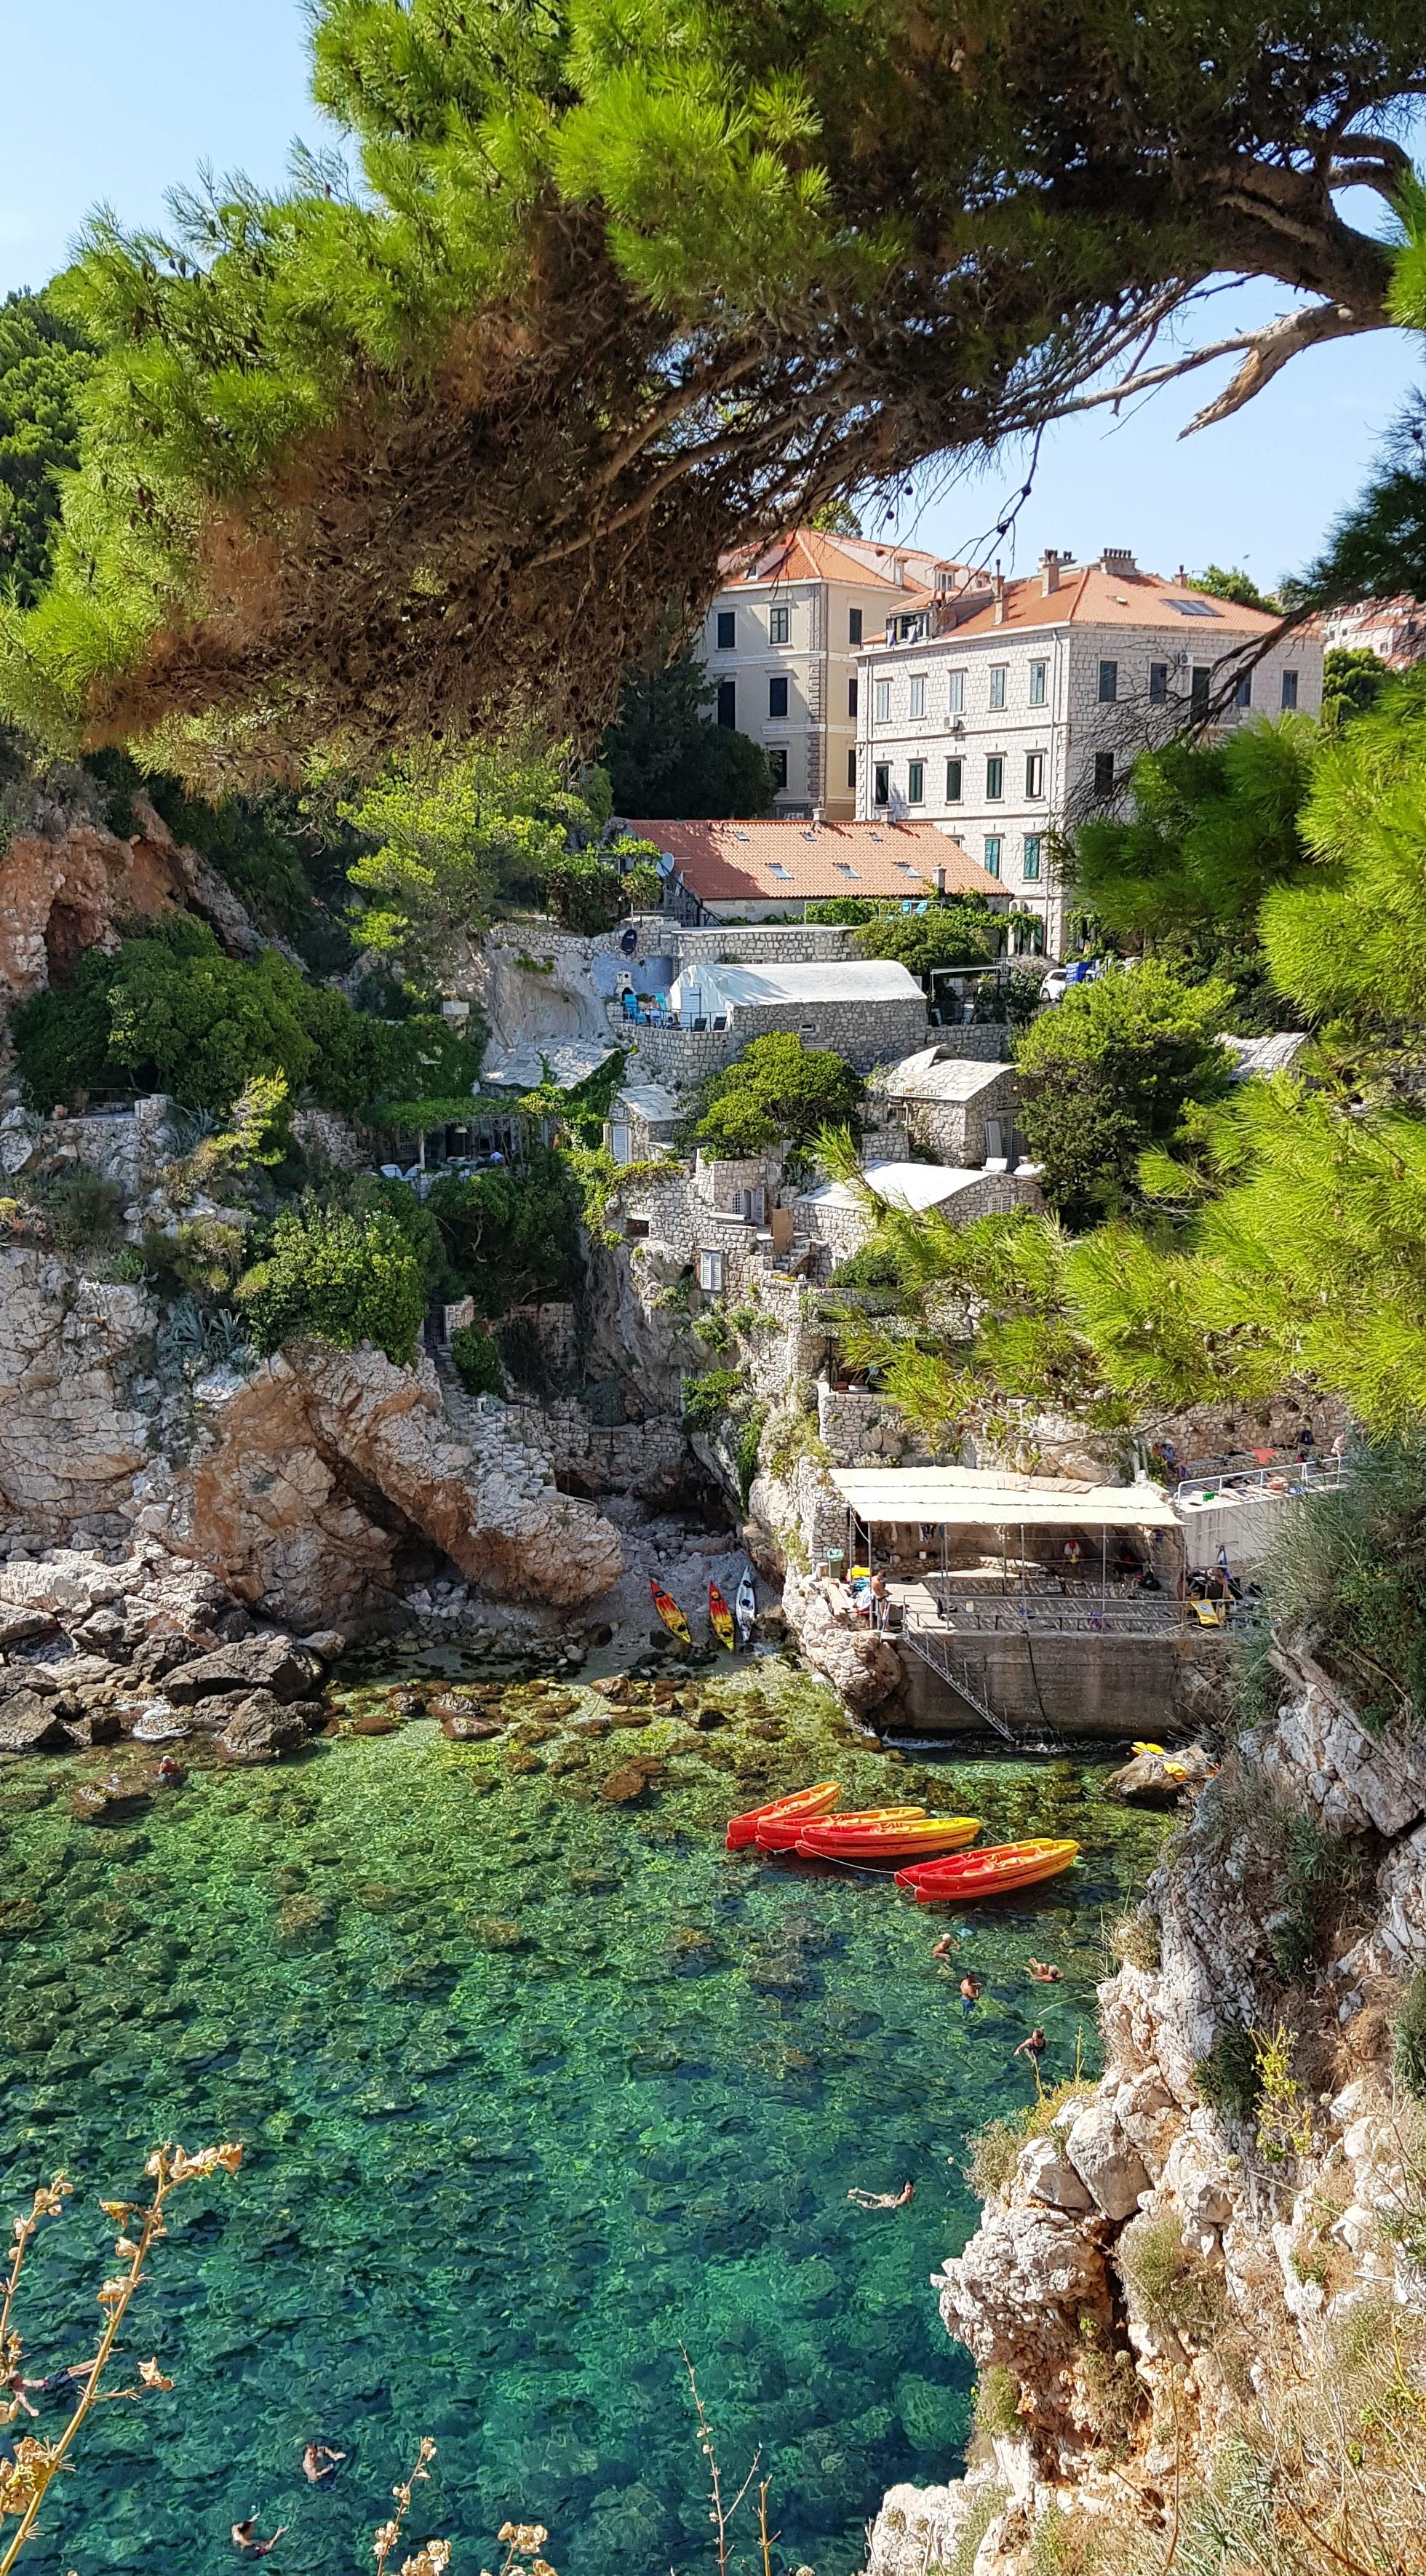 Šulić beach (Kolorina) in Dubrovnik, from above